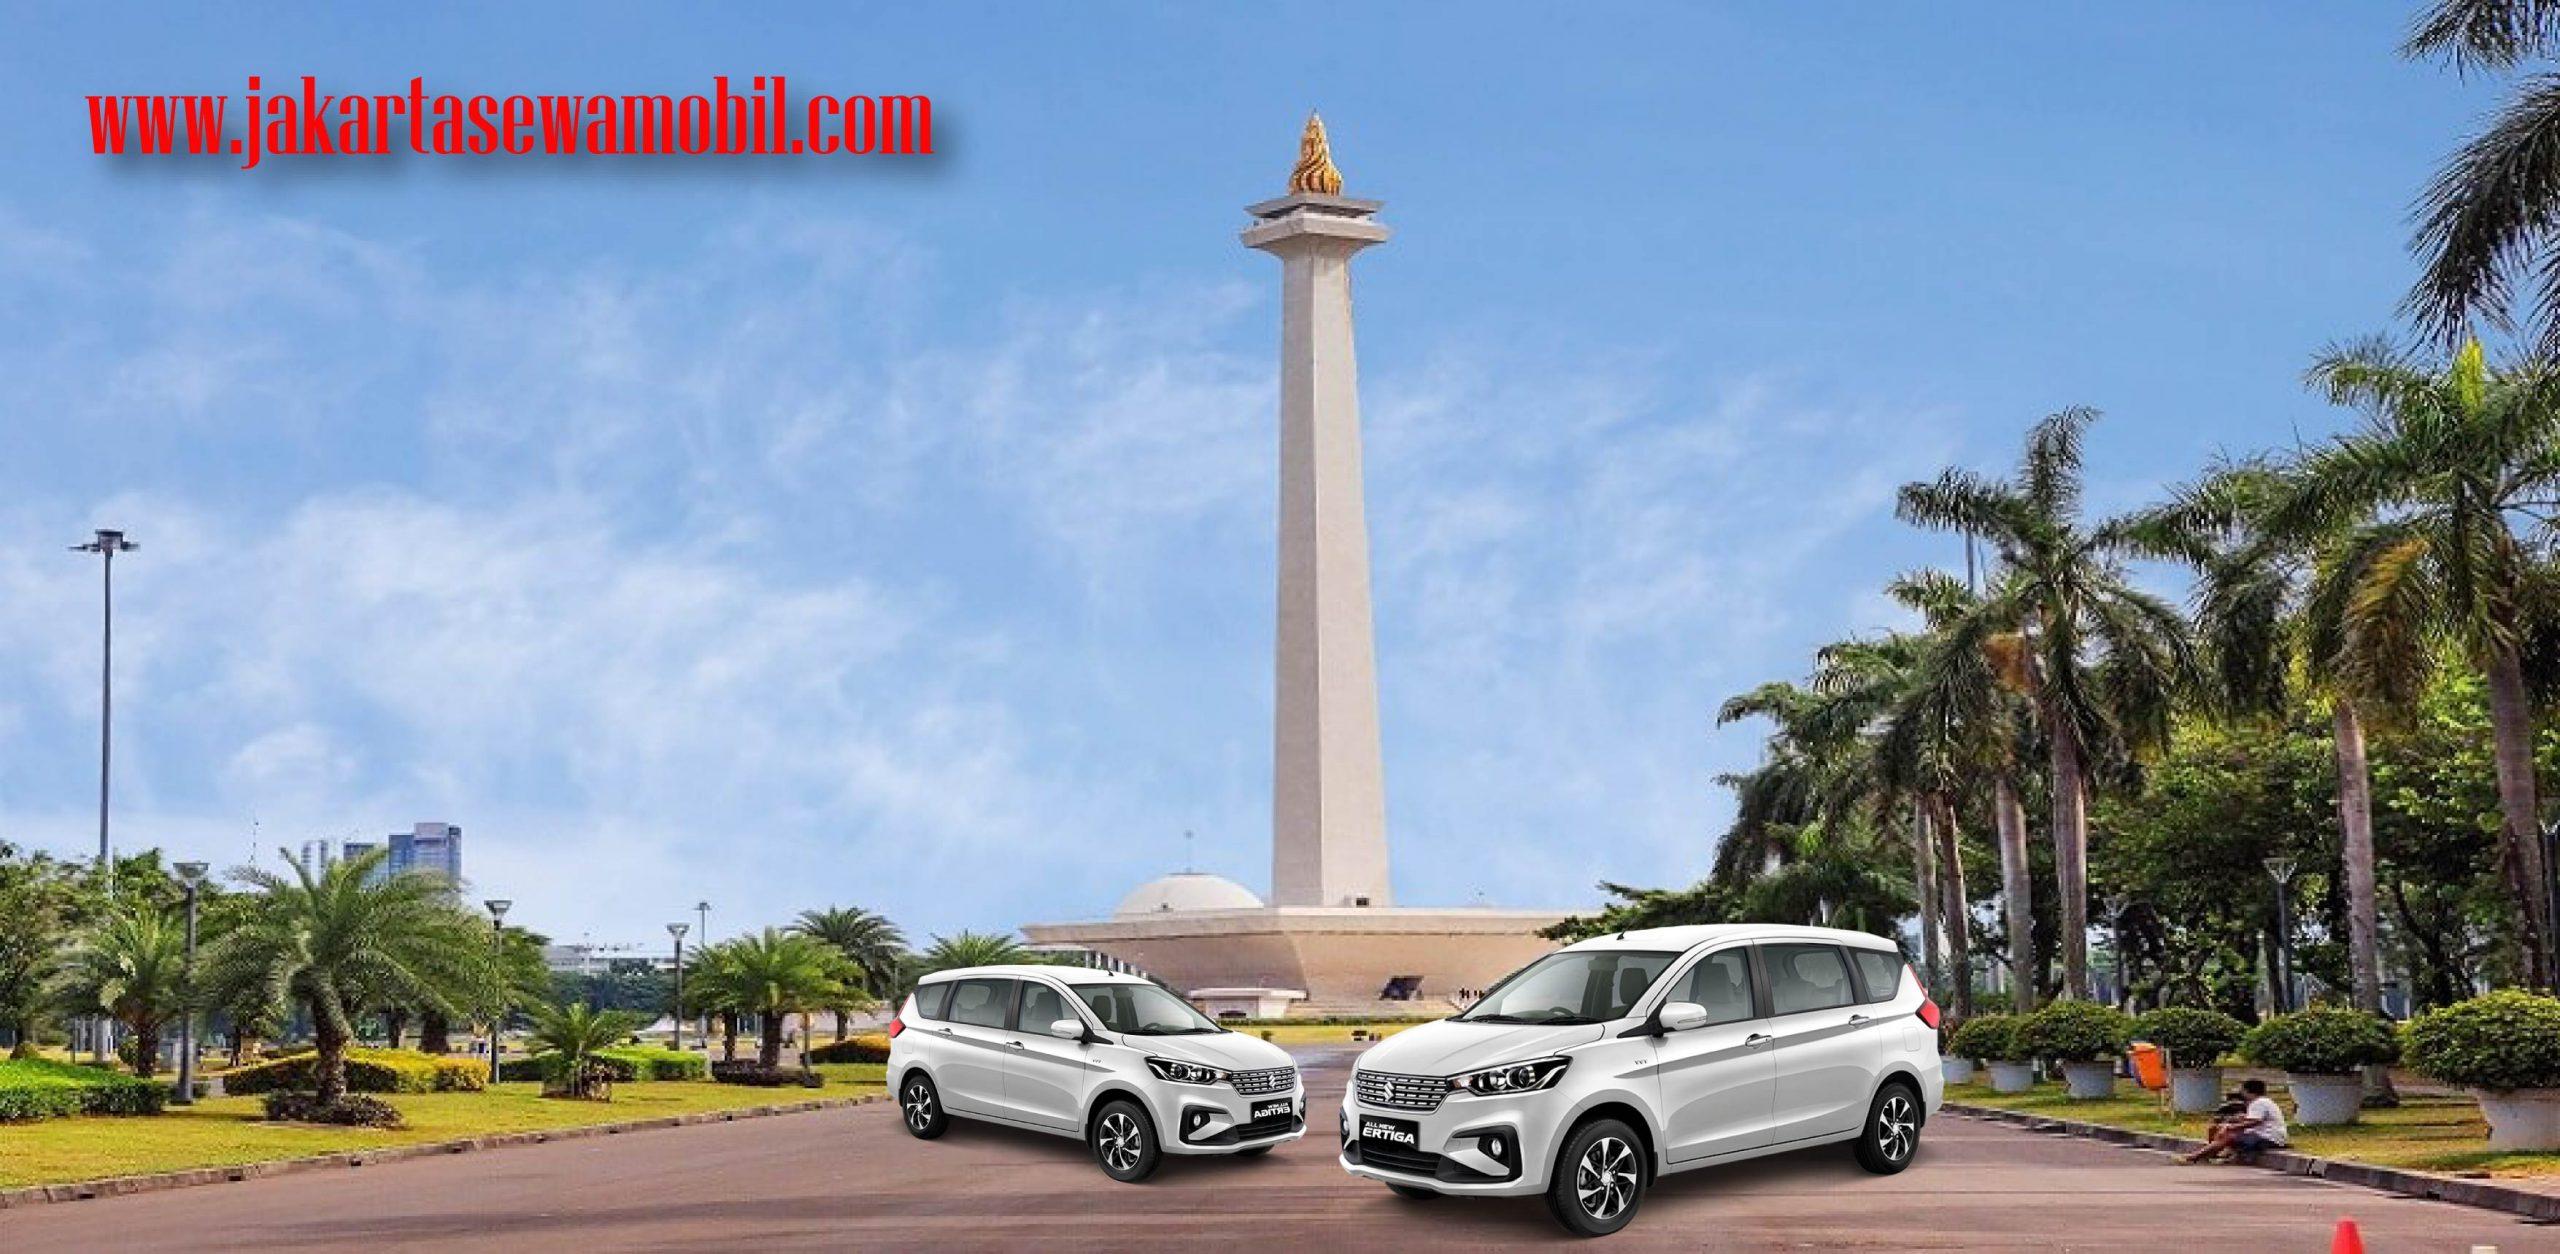 Rental Mobil Cempaka Putih Jakarta